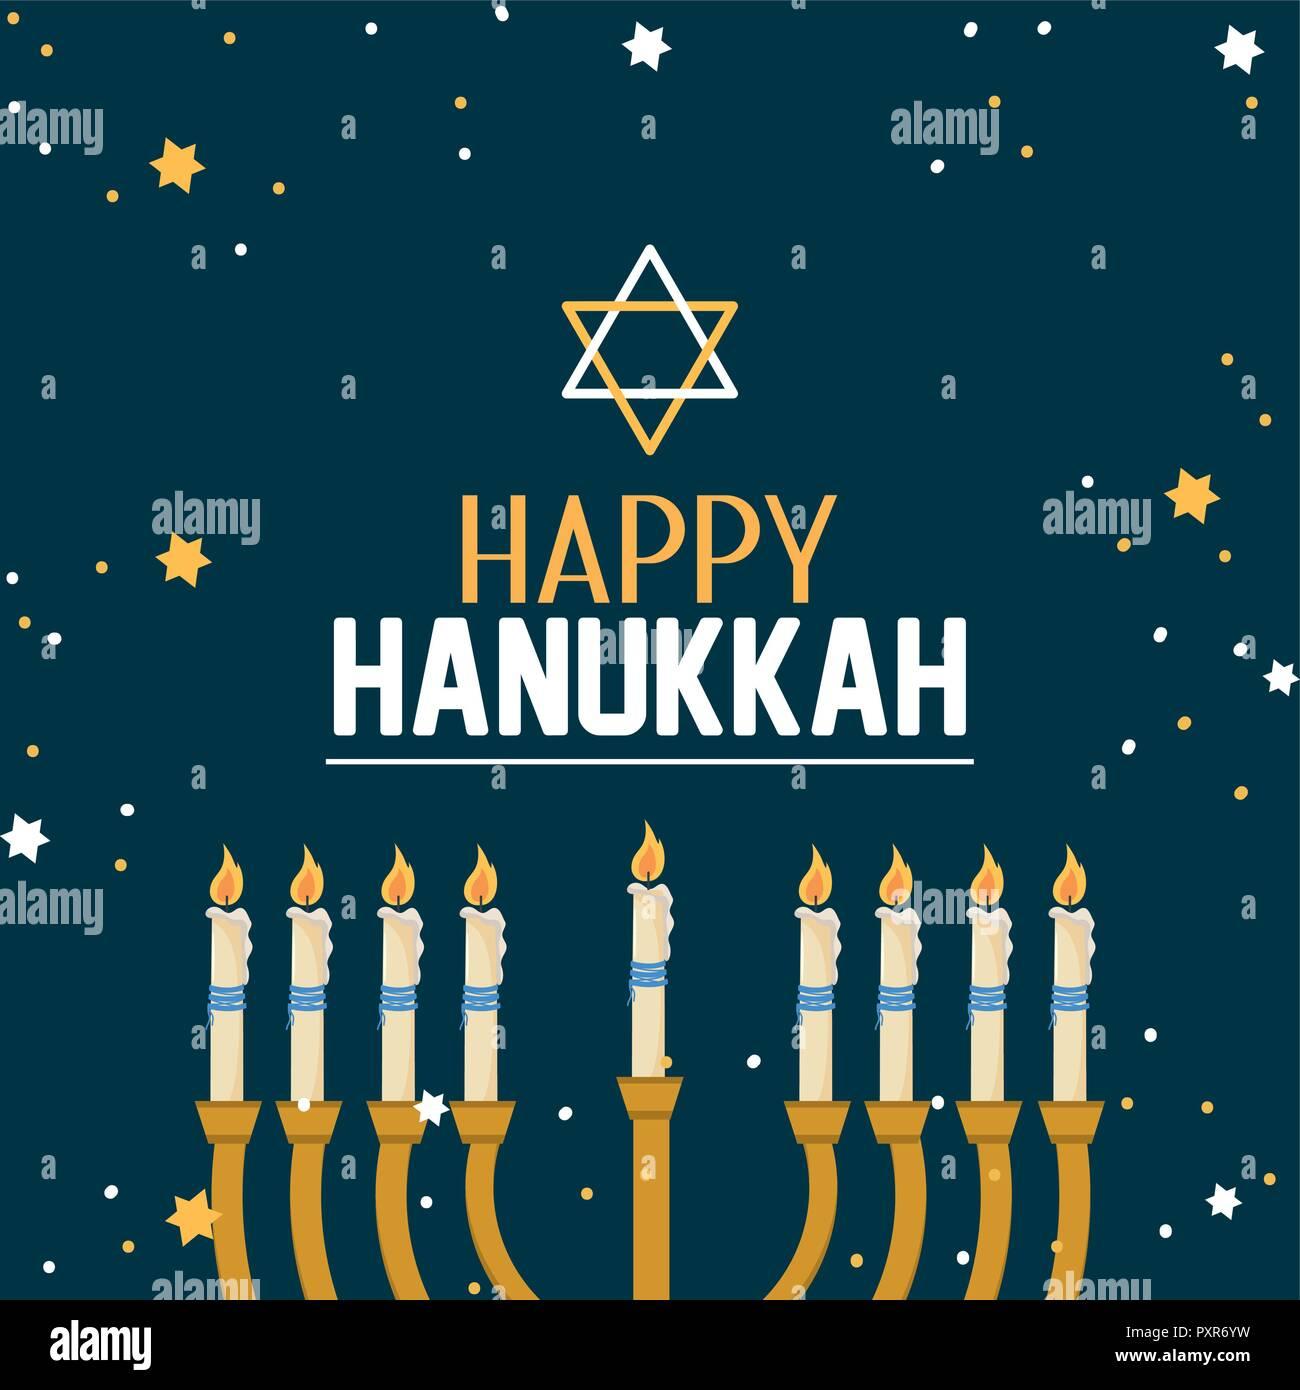 happy hanukkah decoration with david star - Stock Image